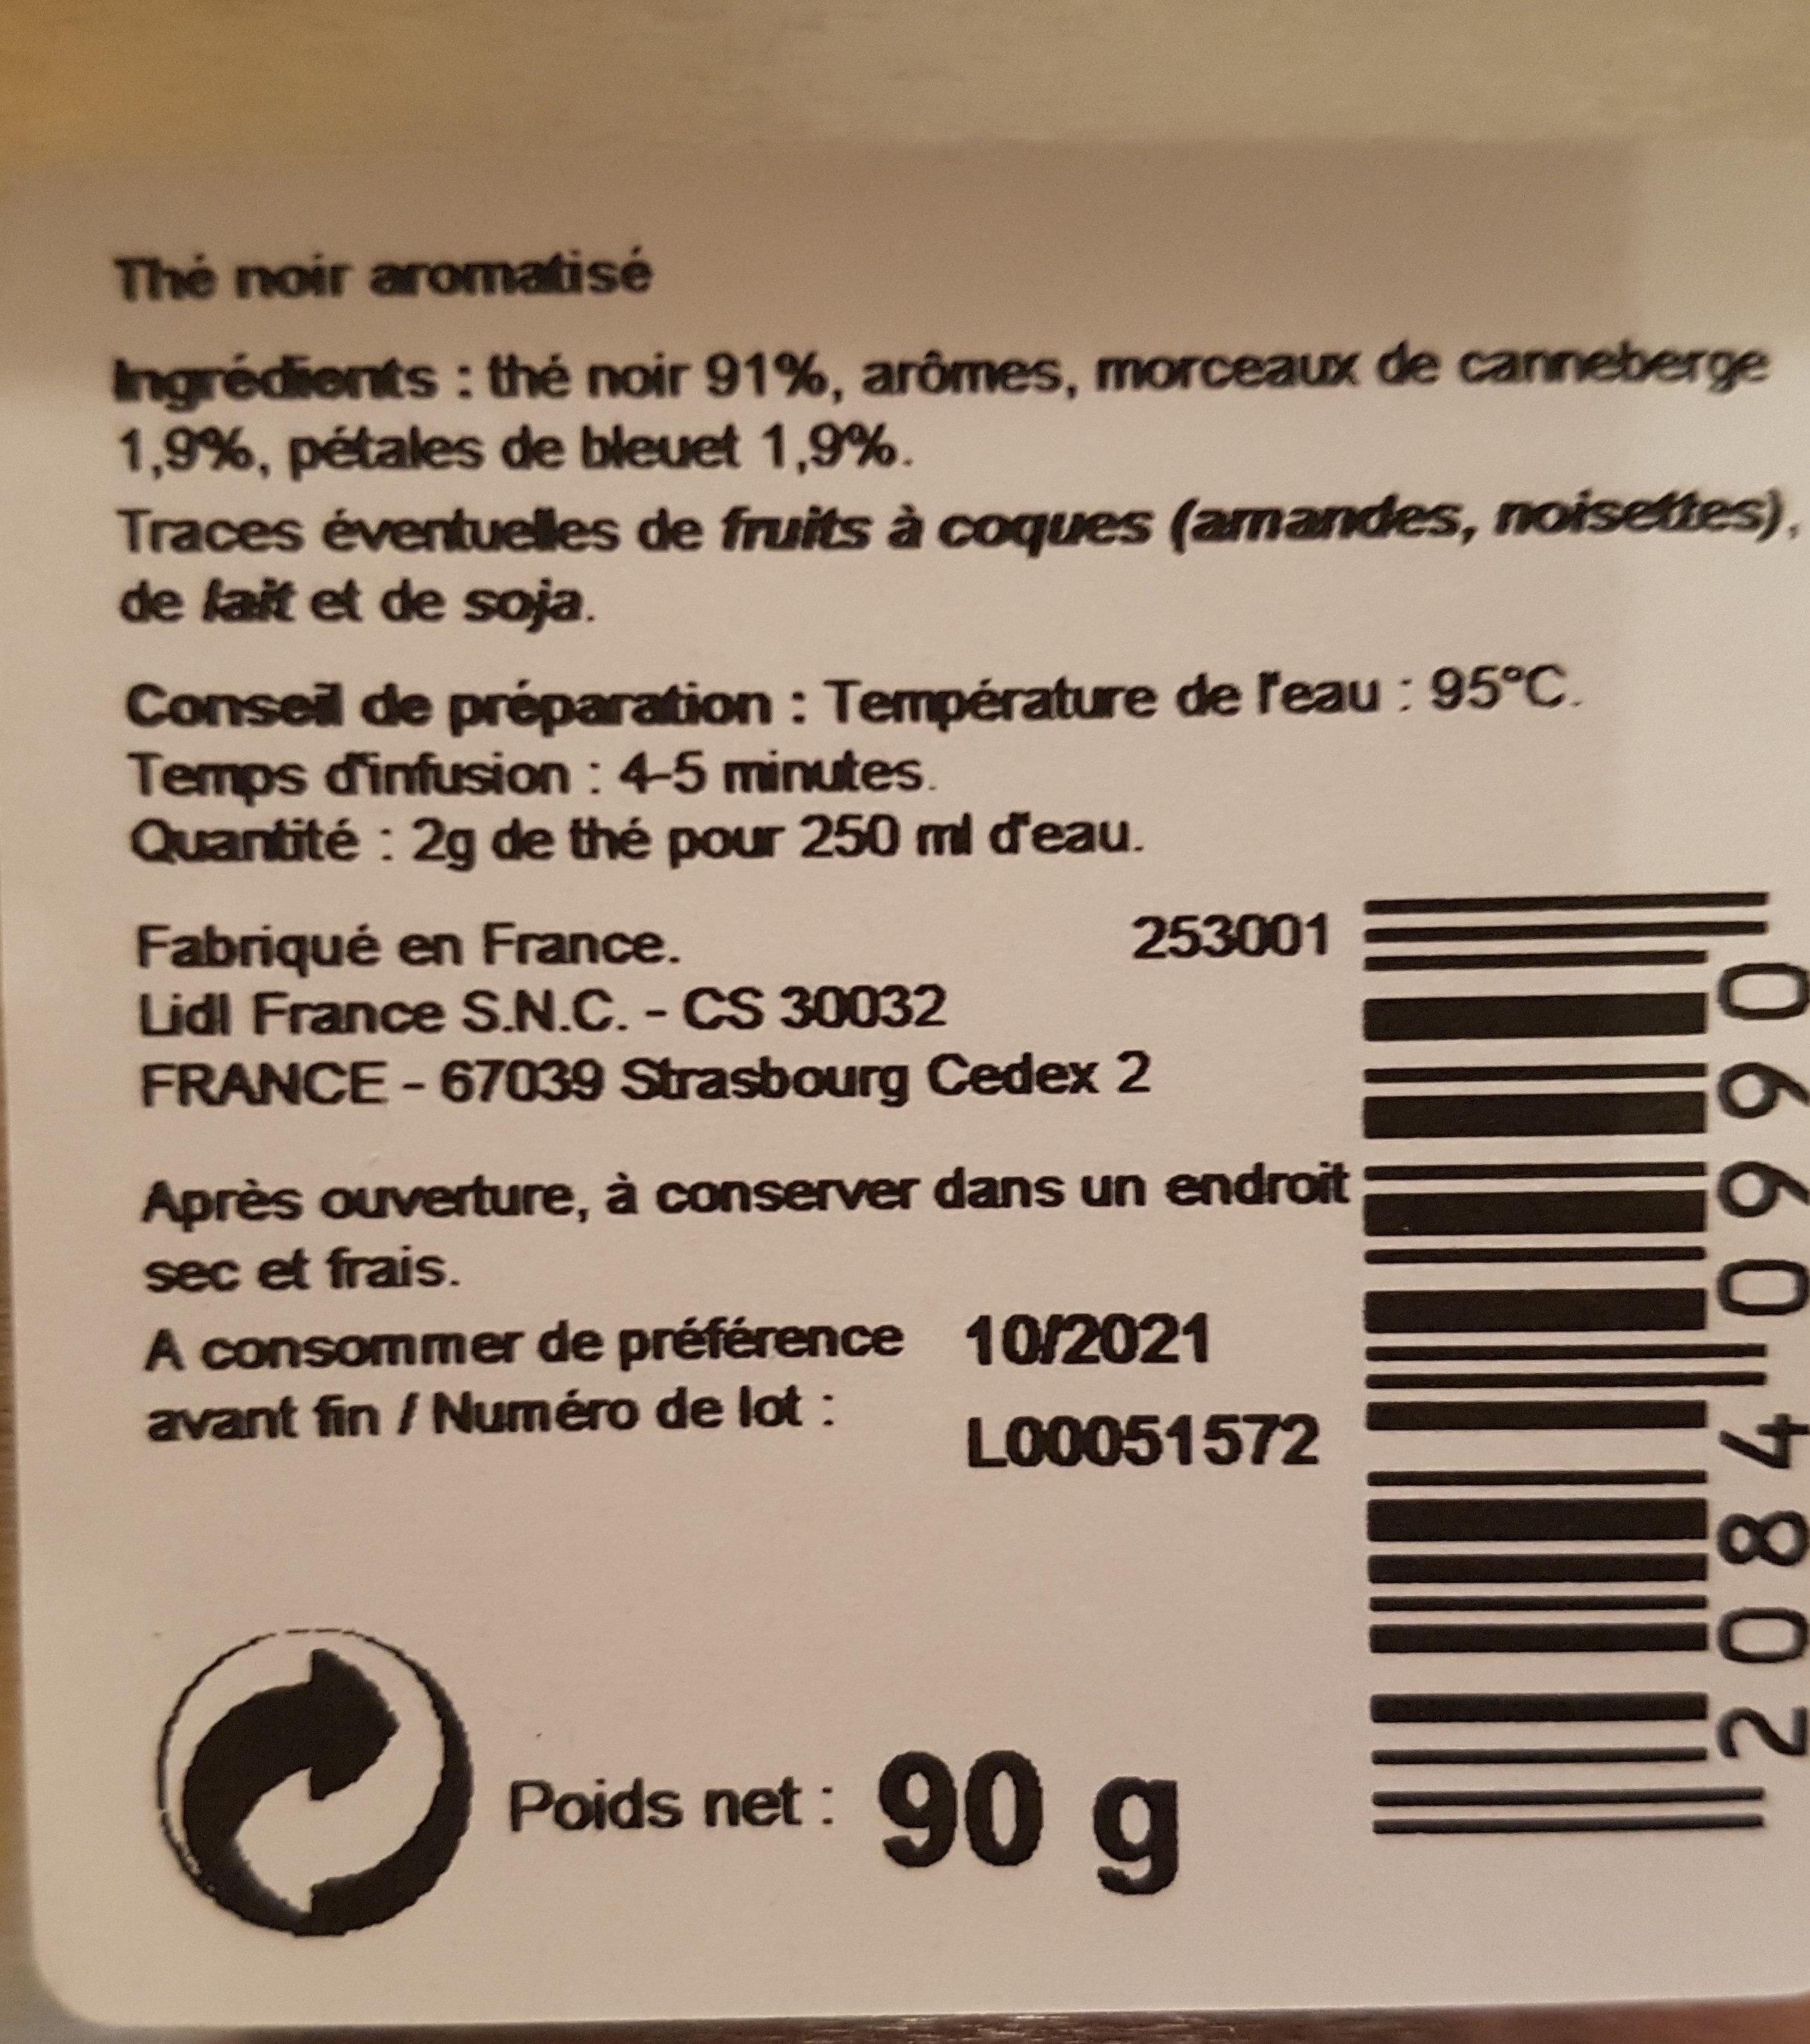 Thé de Noël canneberge - Ingredients - fr